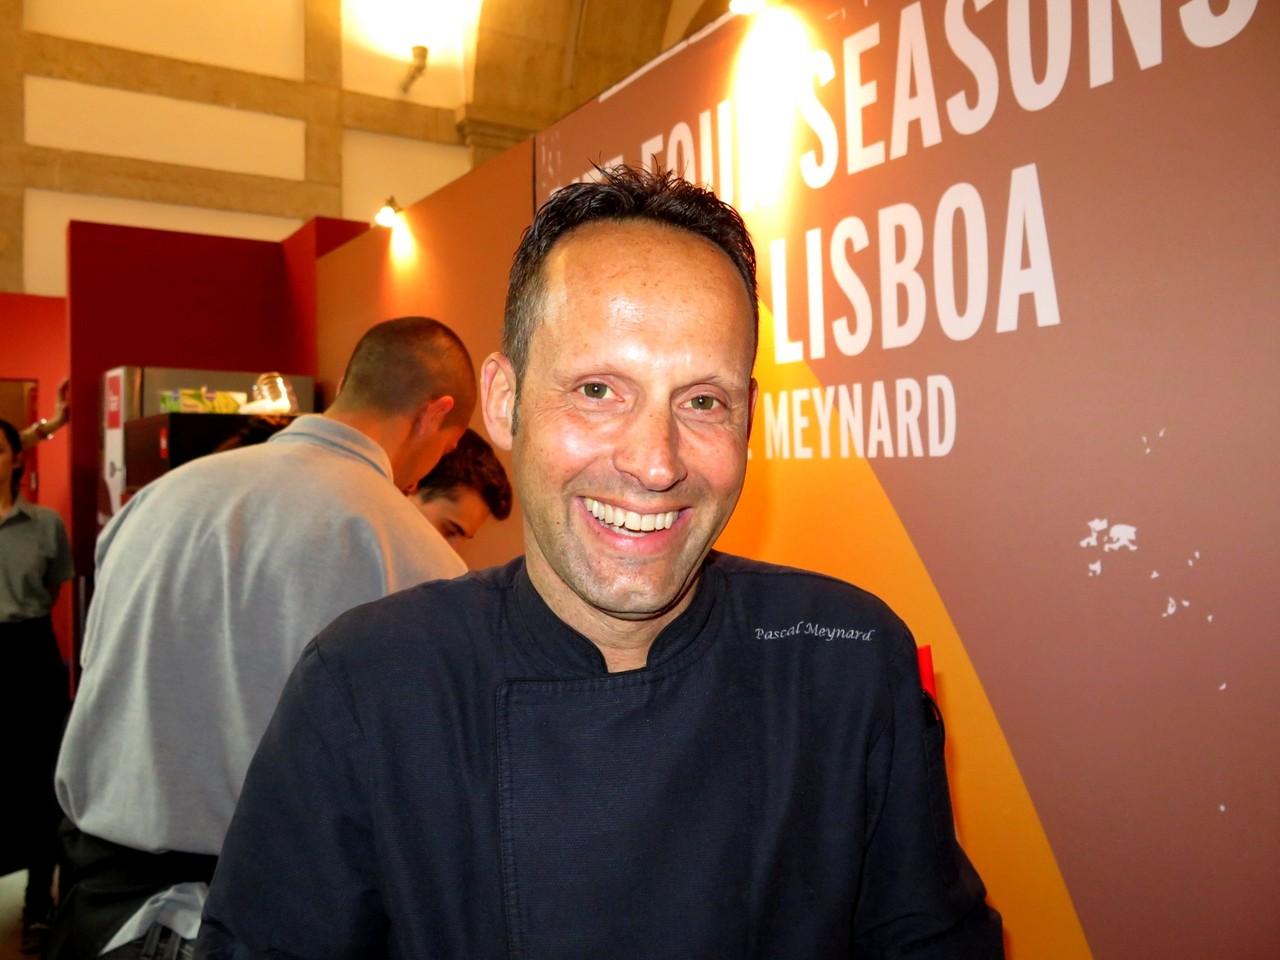 Pascal Meynard